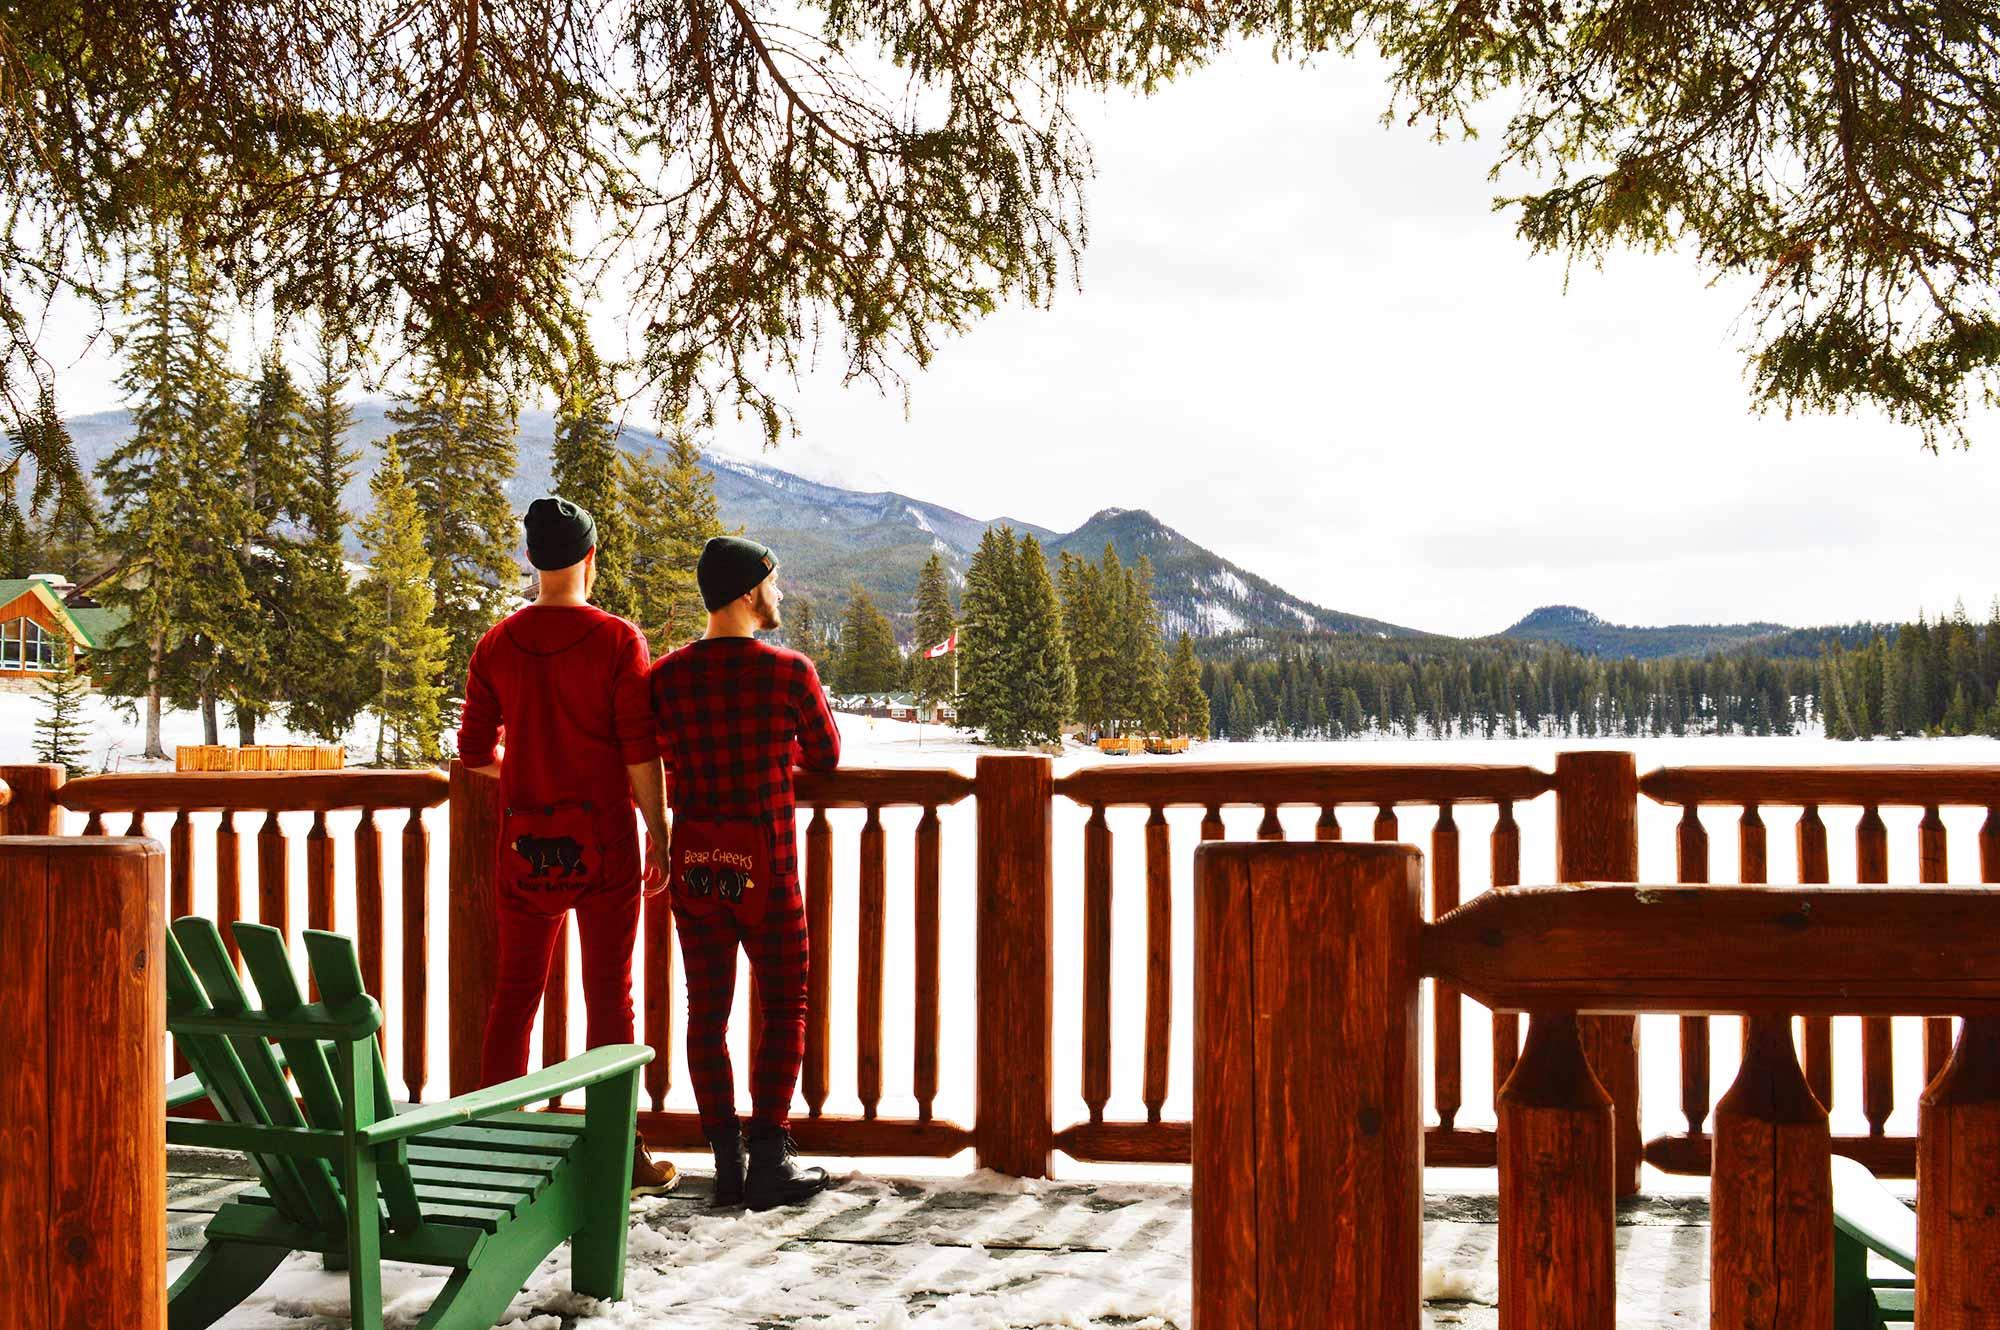 Fairmont Jasper Park Lodge Alberta Canada © CoupleofMen.com